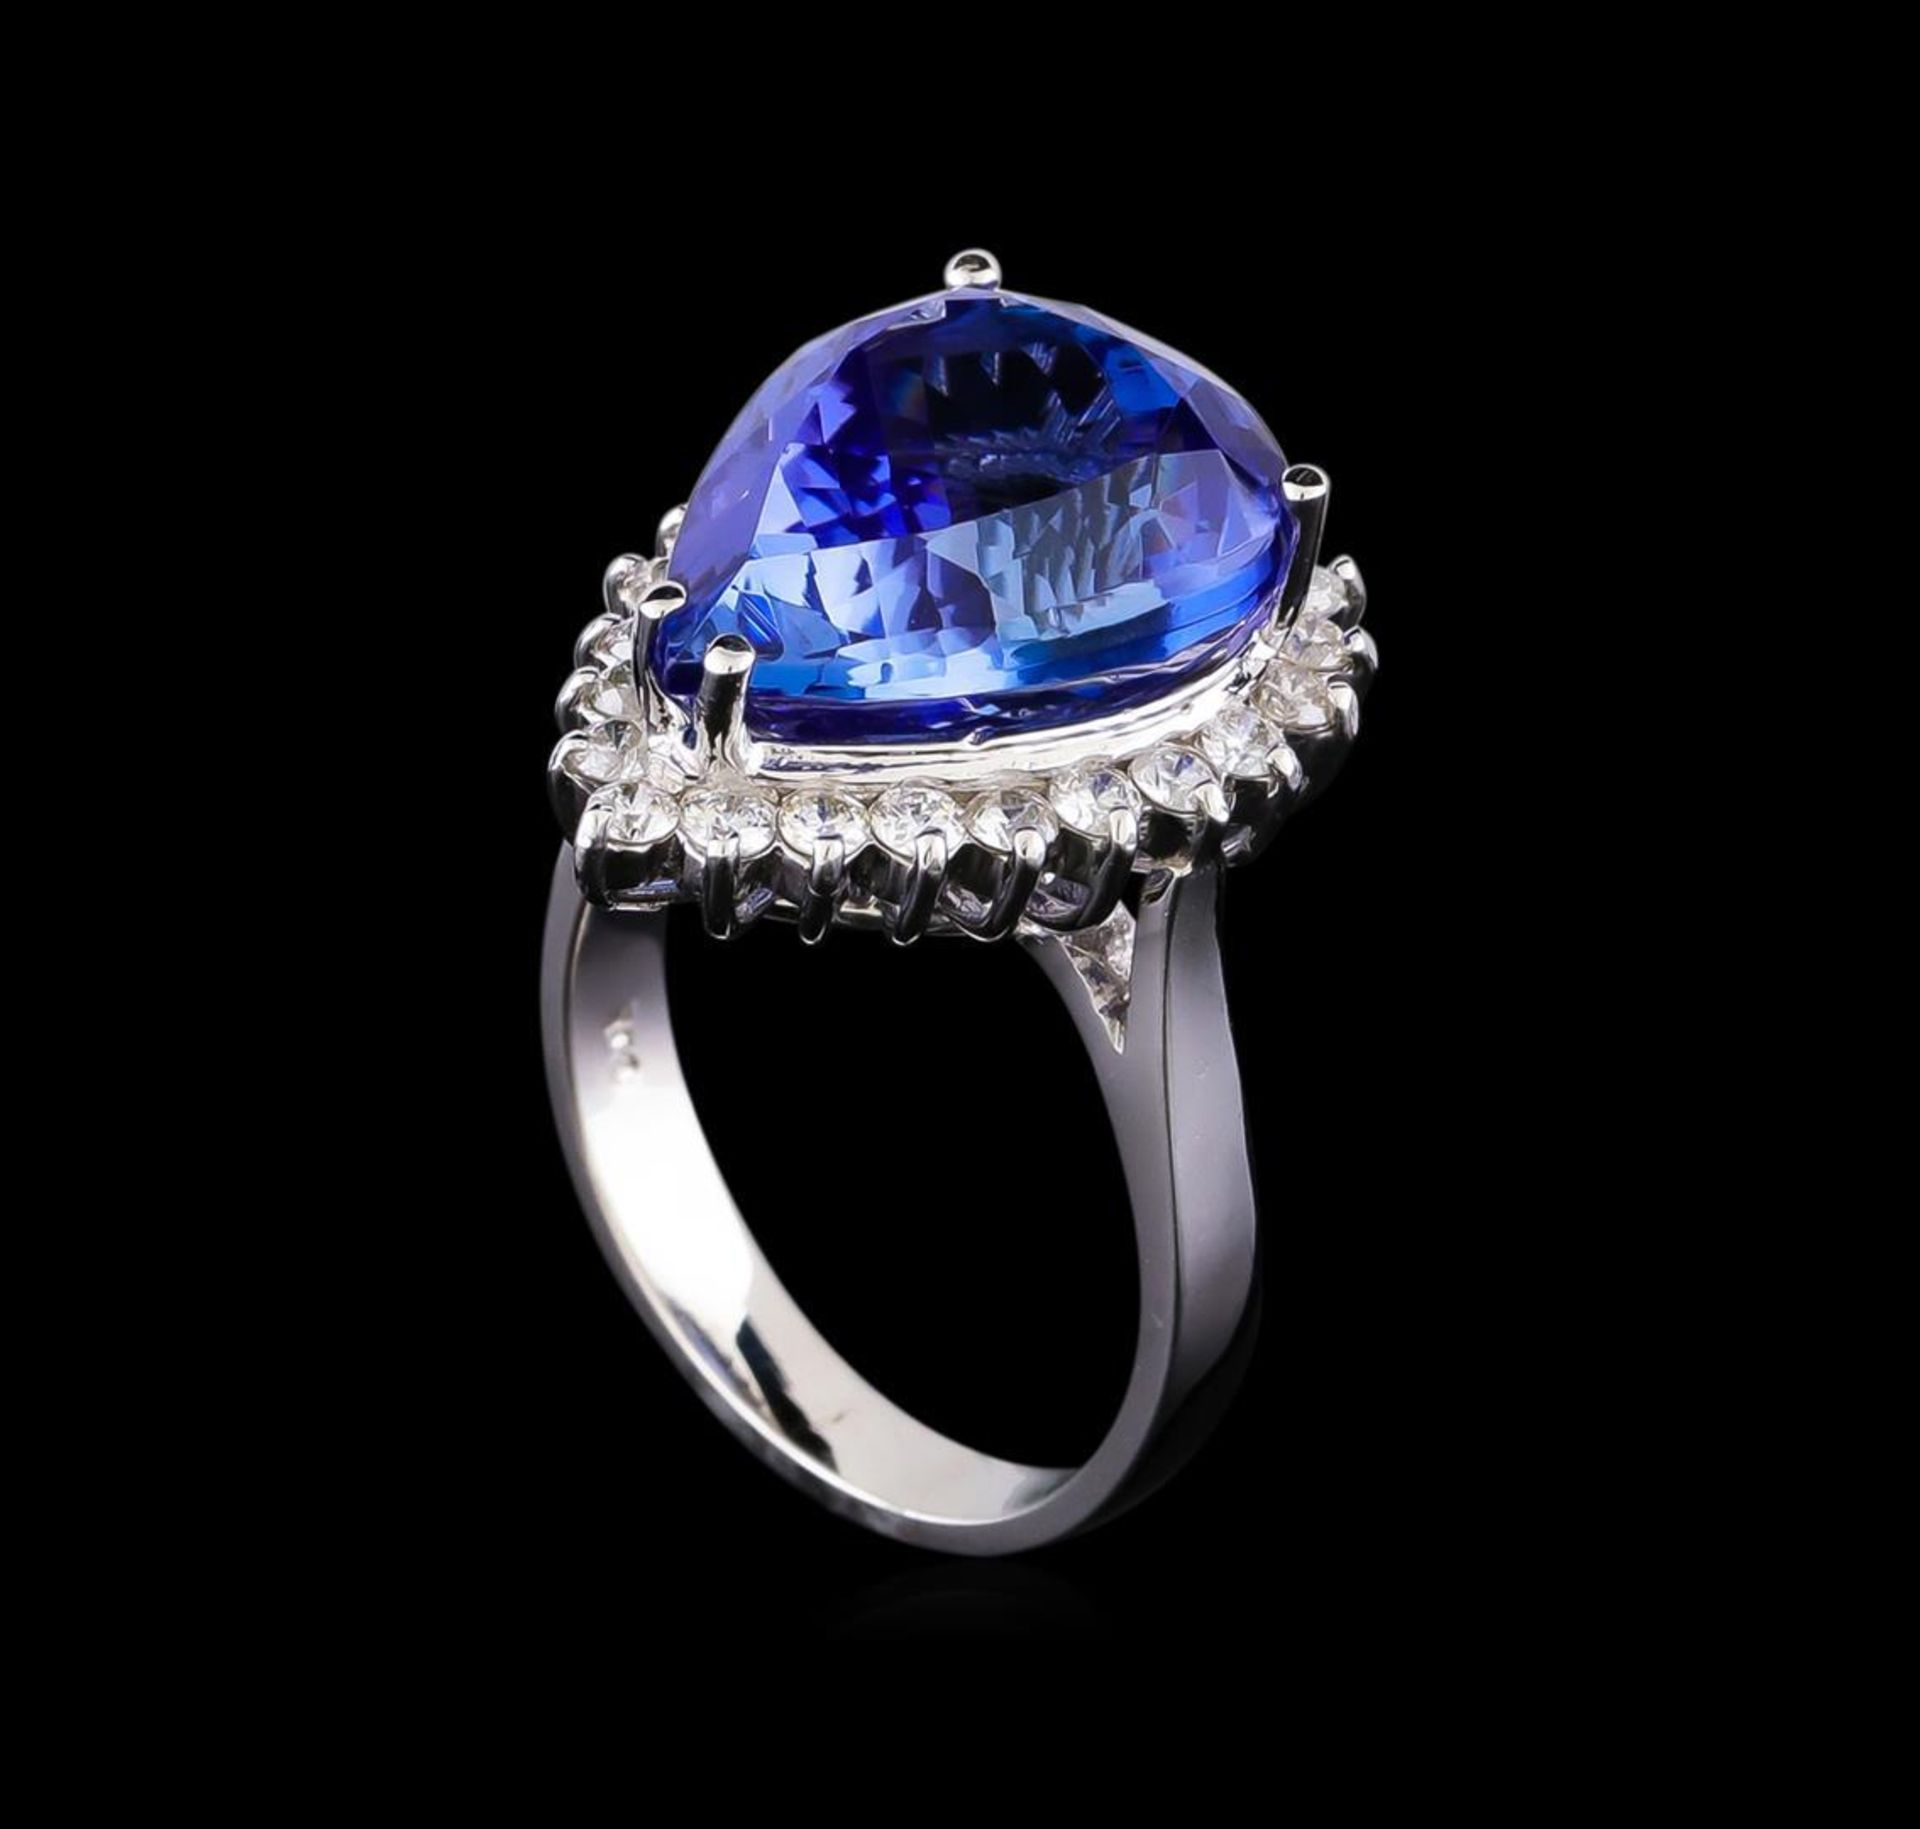 11.38 ctw Tanzanite and Diamond Ring - 14KT White Gold - Image 4 of 5